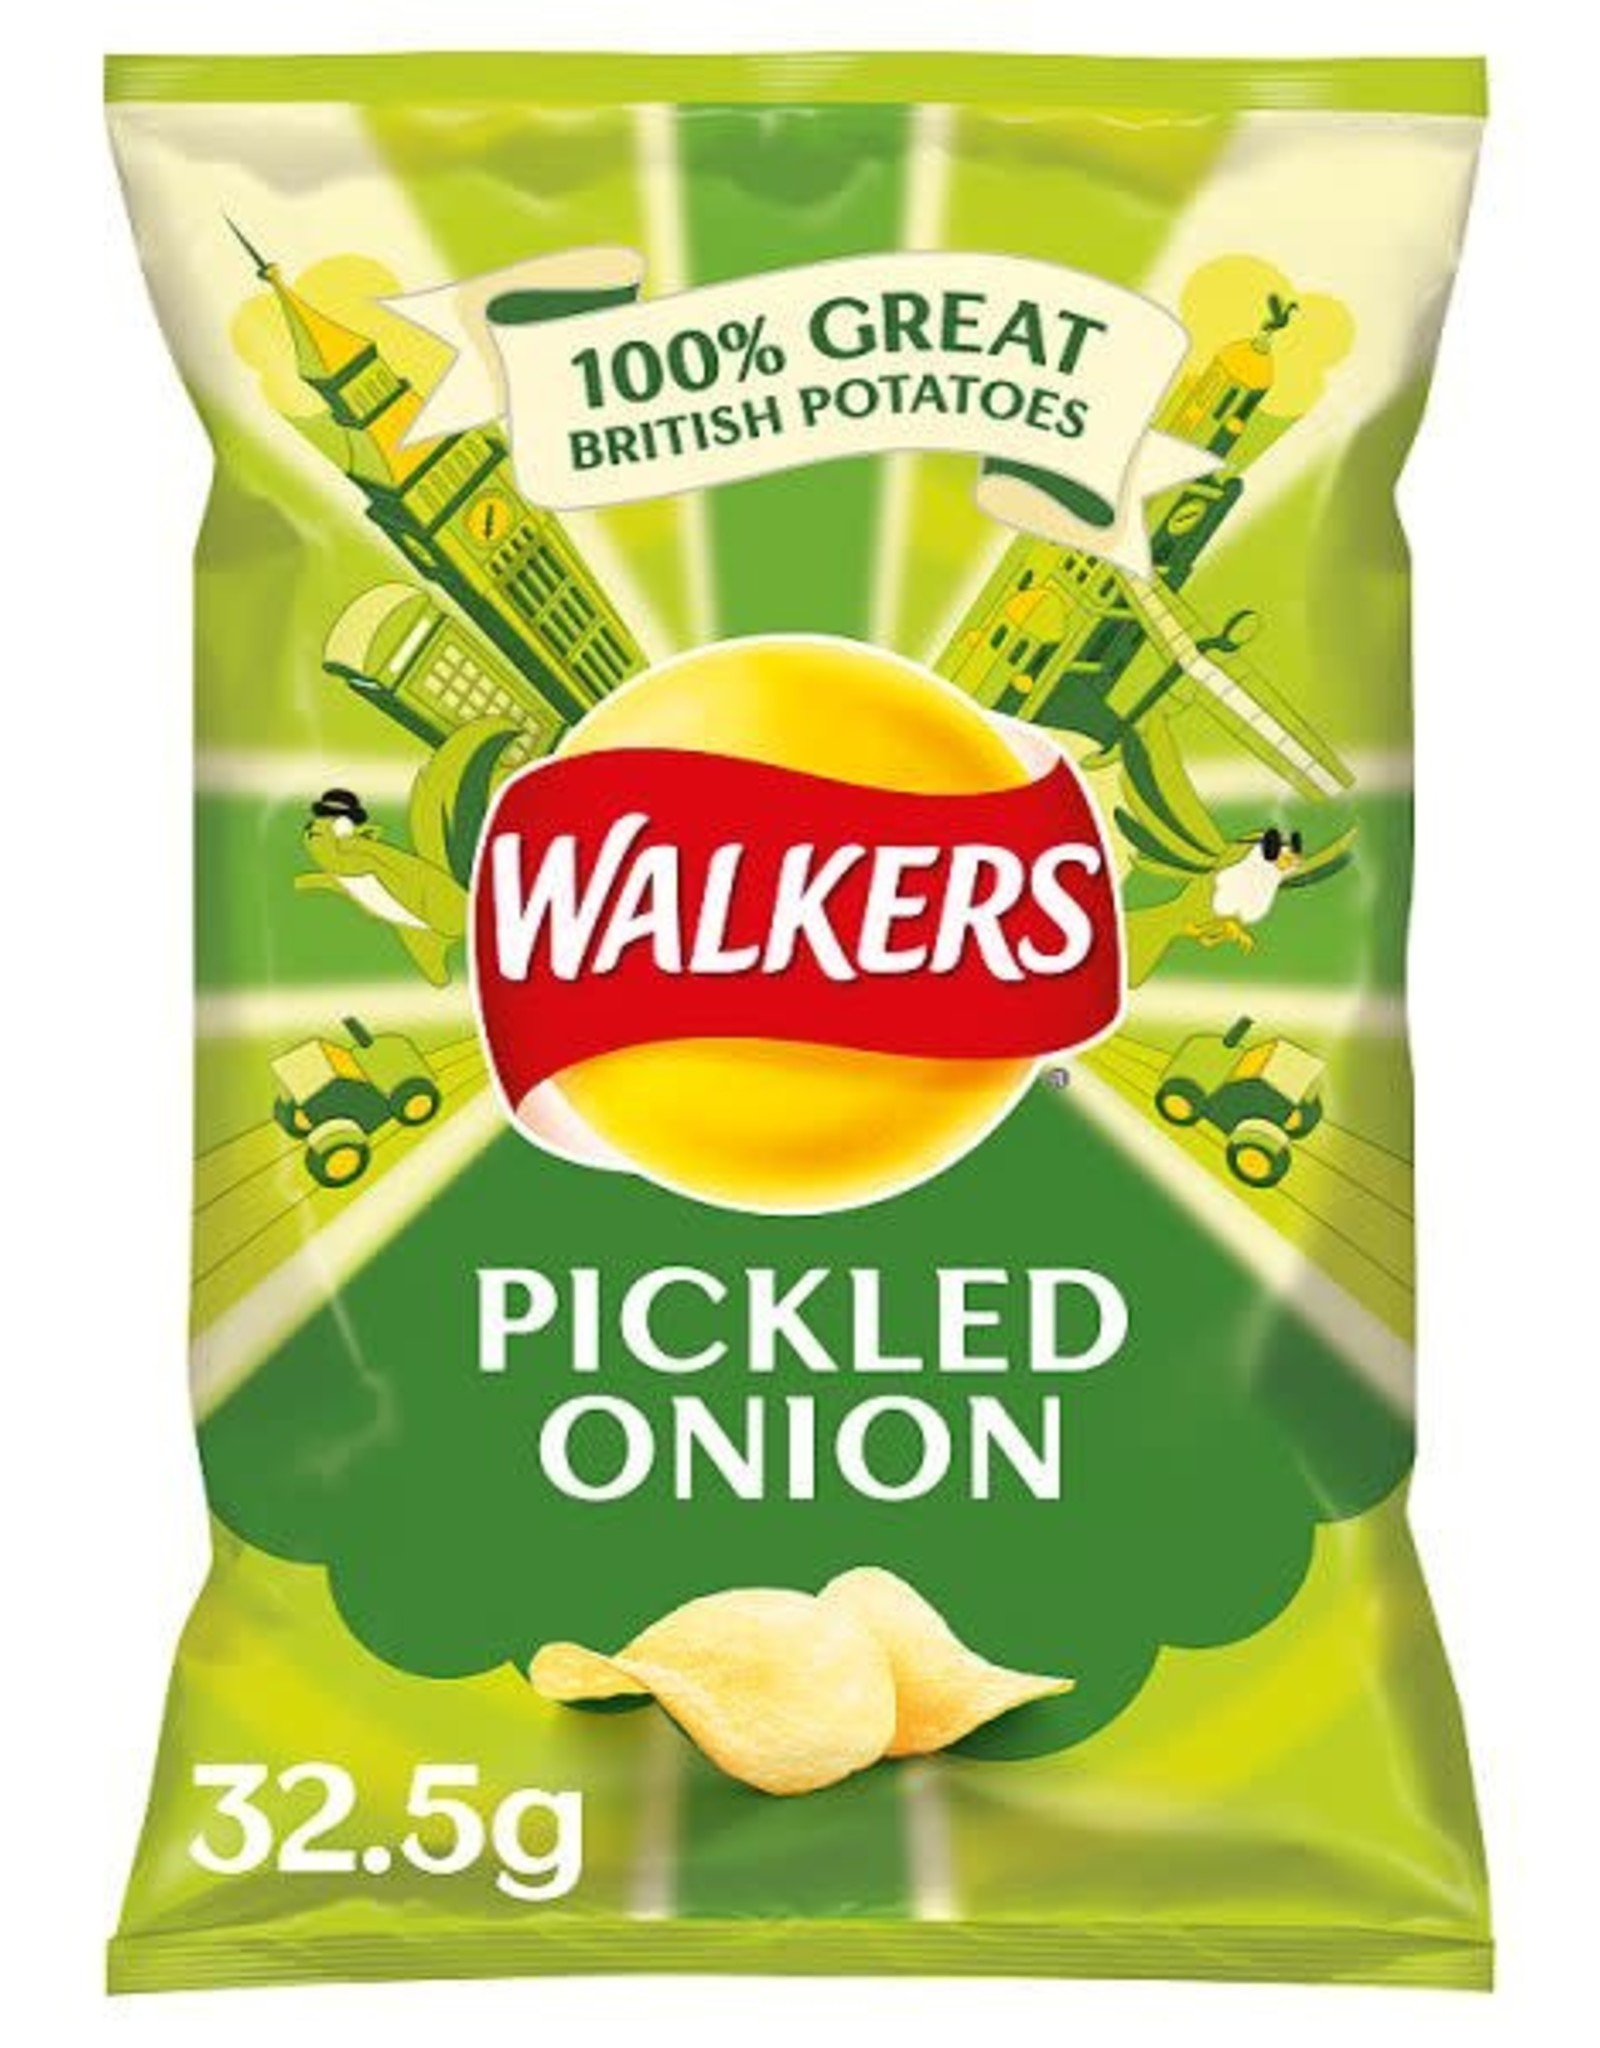 Walkers Walkers Pickled Onion 32,5 g